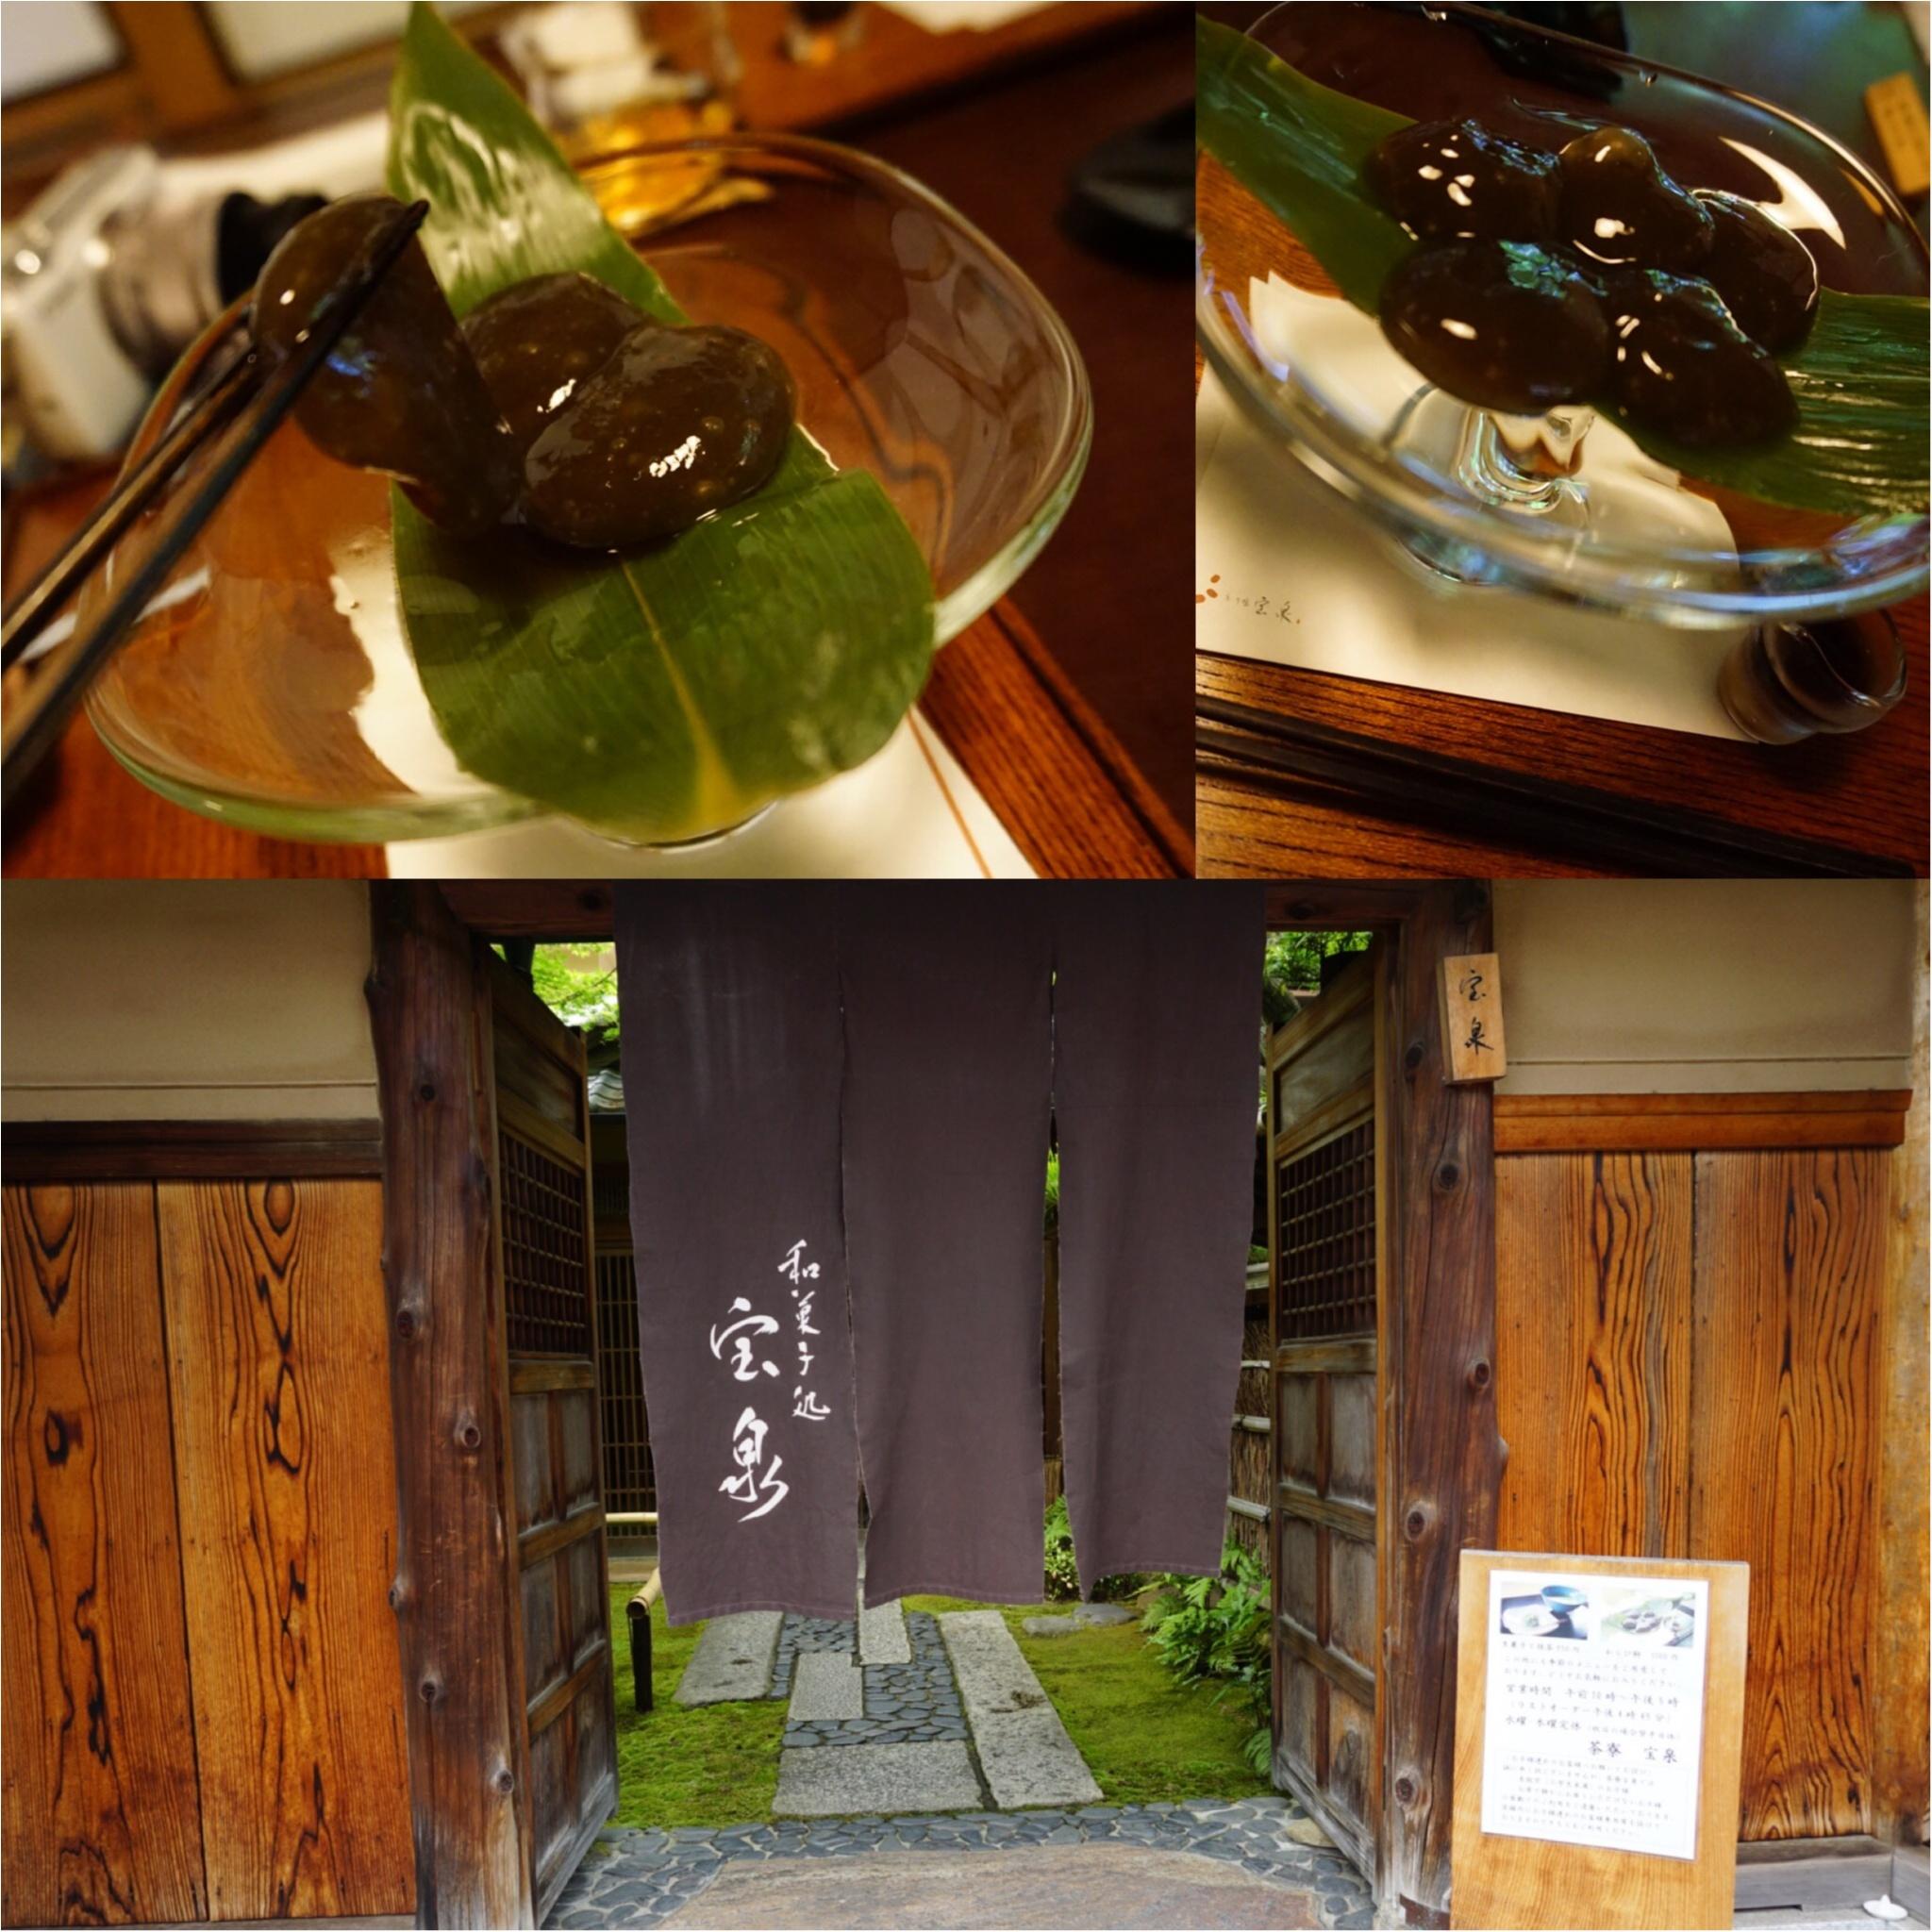 ☺︎♡京都〜抹茶巡りの旅〜わらび餅&パフェ&茶蕎麦_1